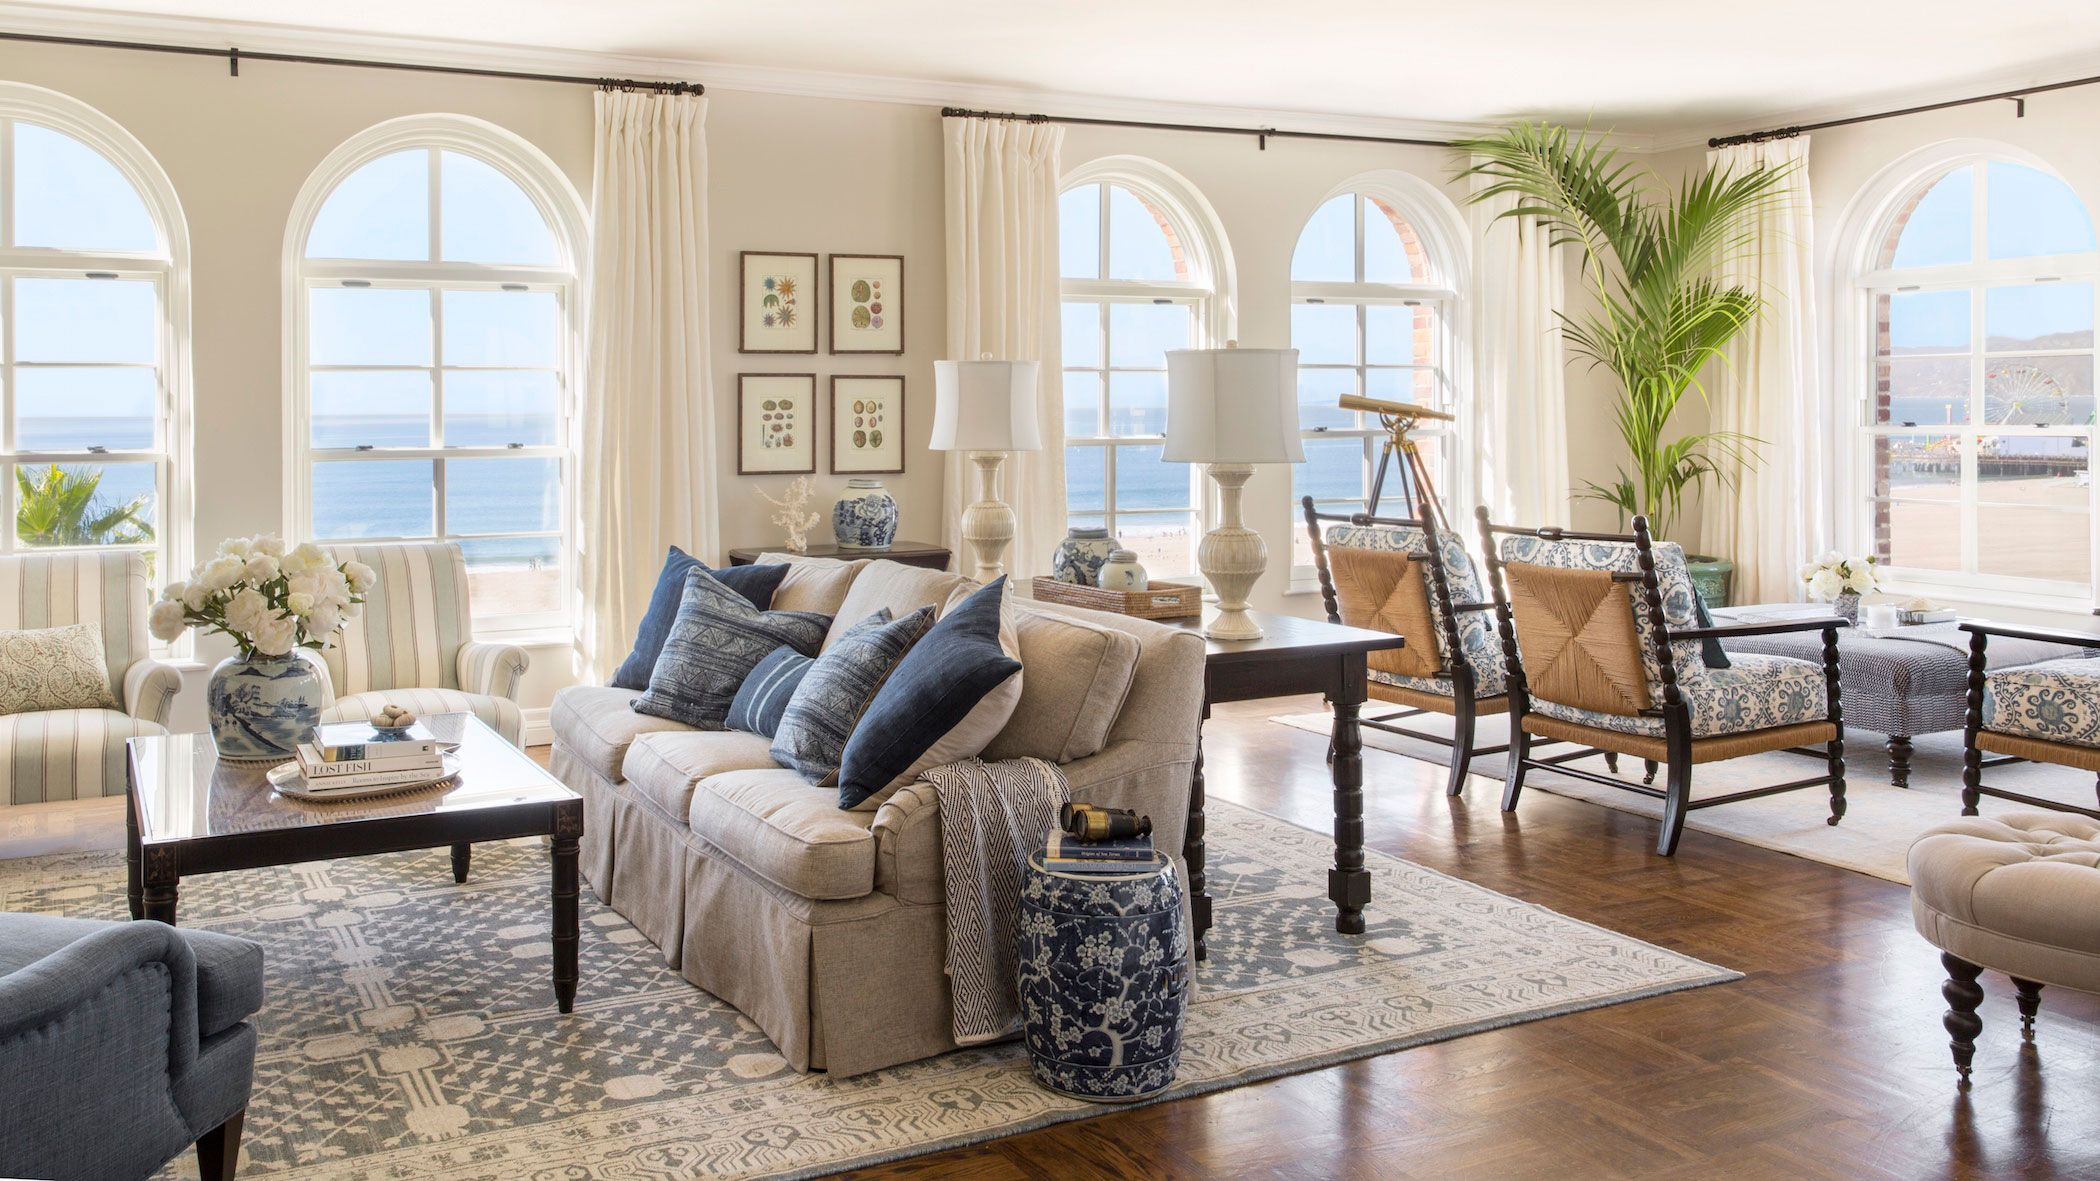 Ocean View Room Shutters on the Beach luxury hotel Santa